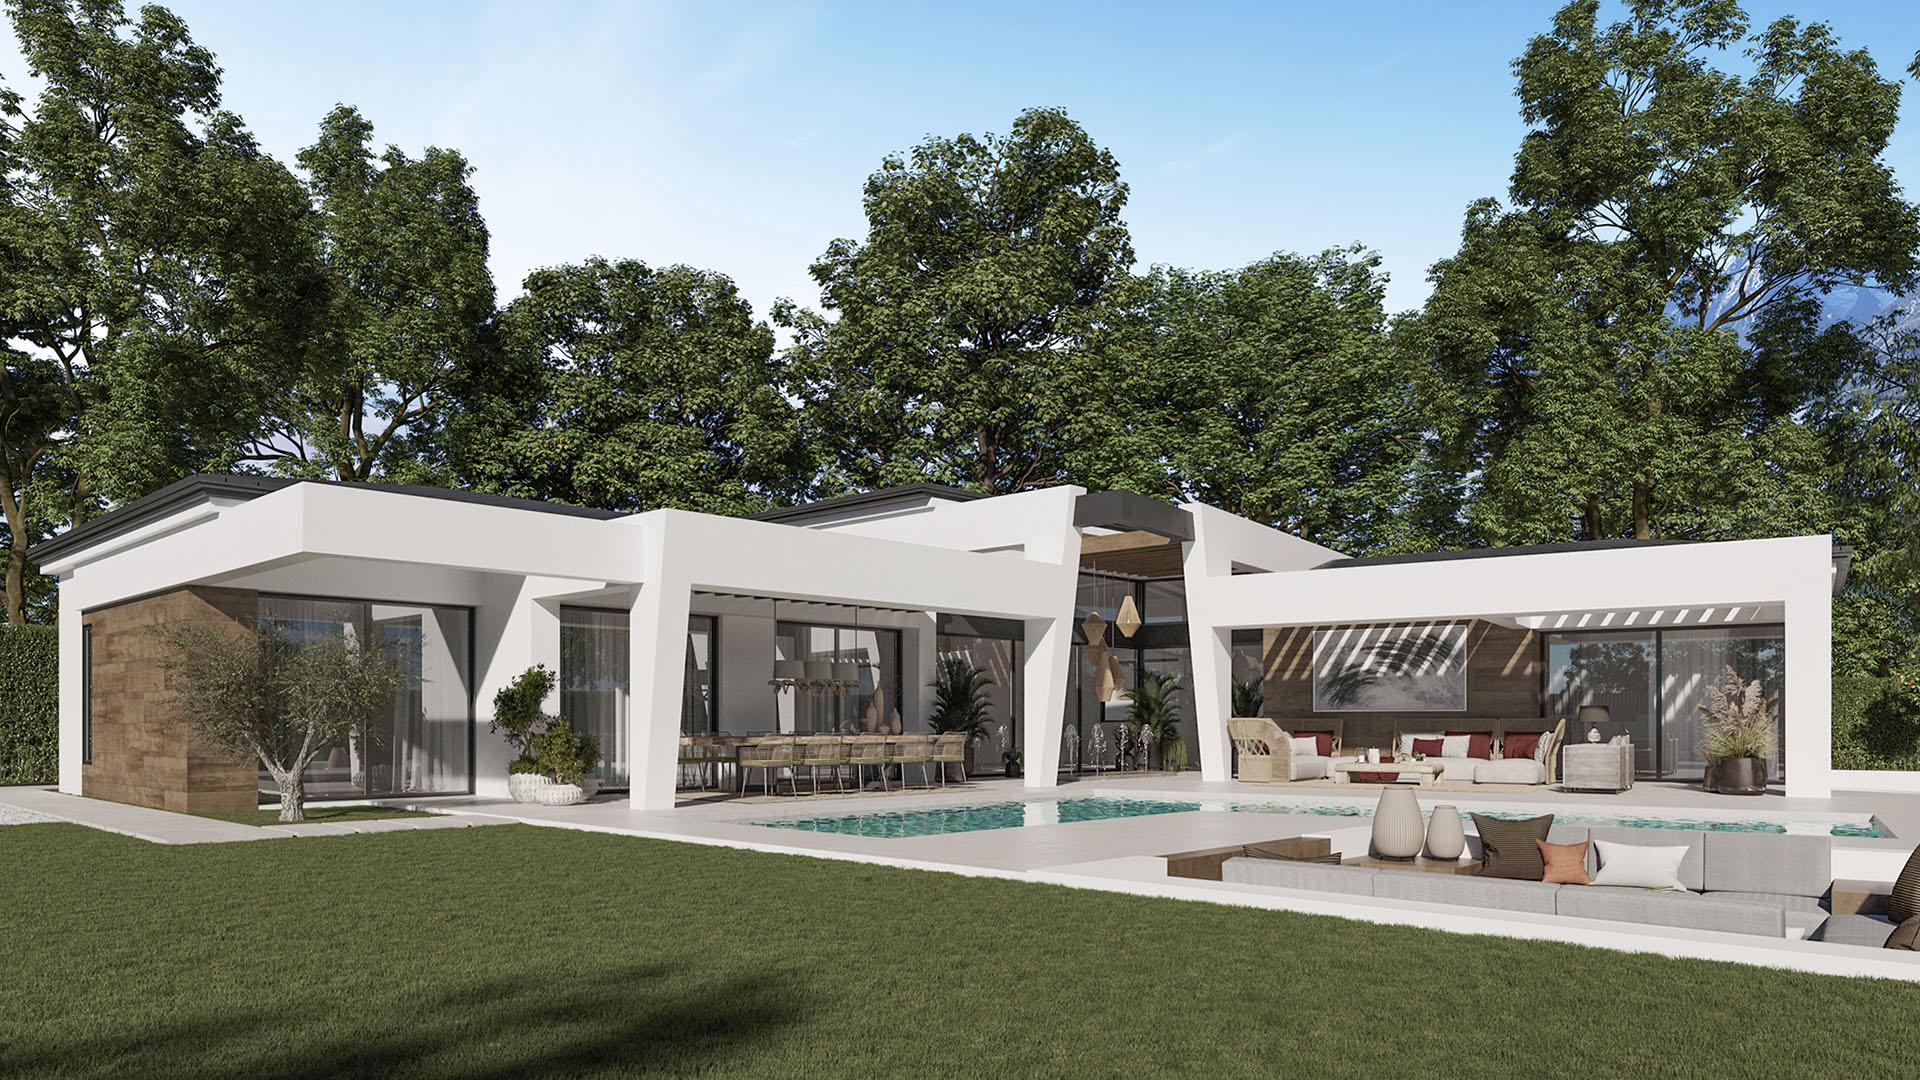 Marein Natura: Modern luxury villas in Nueva Andalucía, Marbella